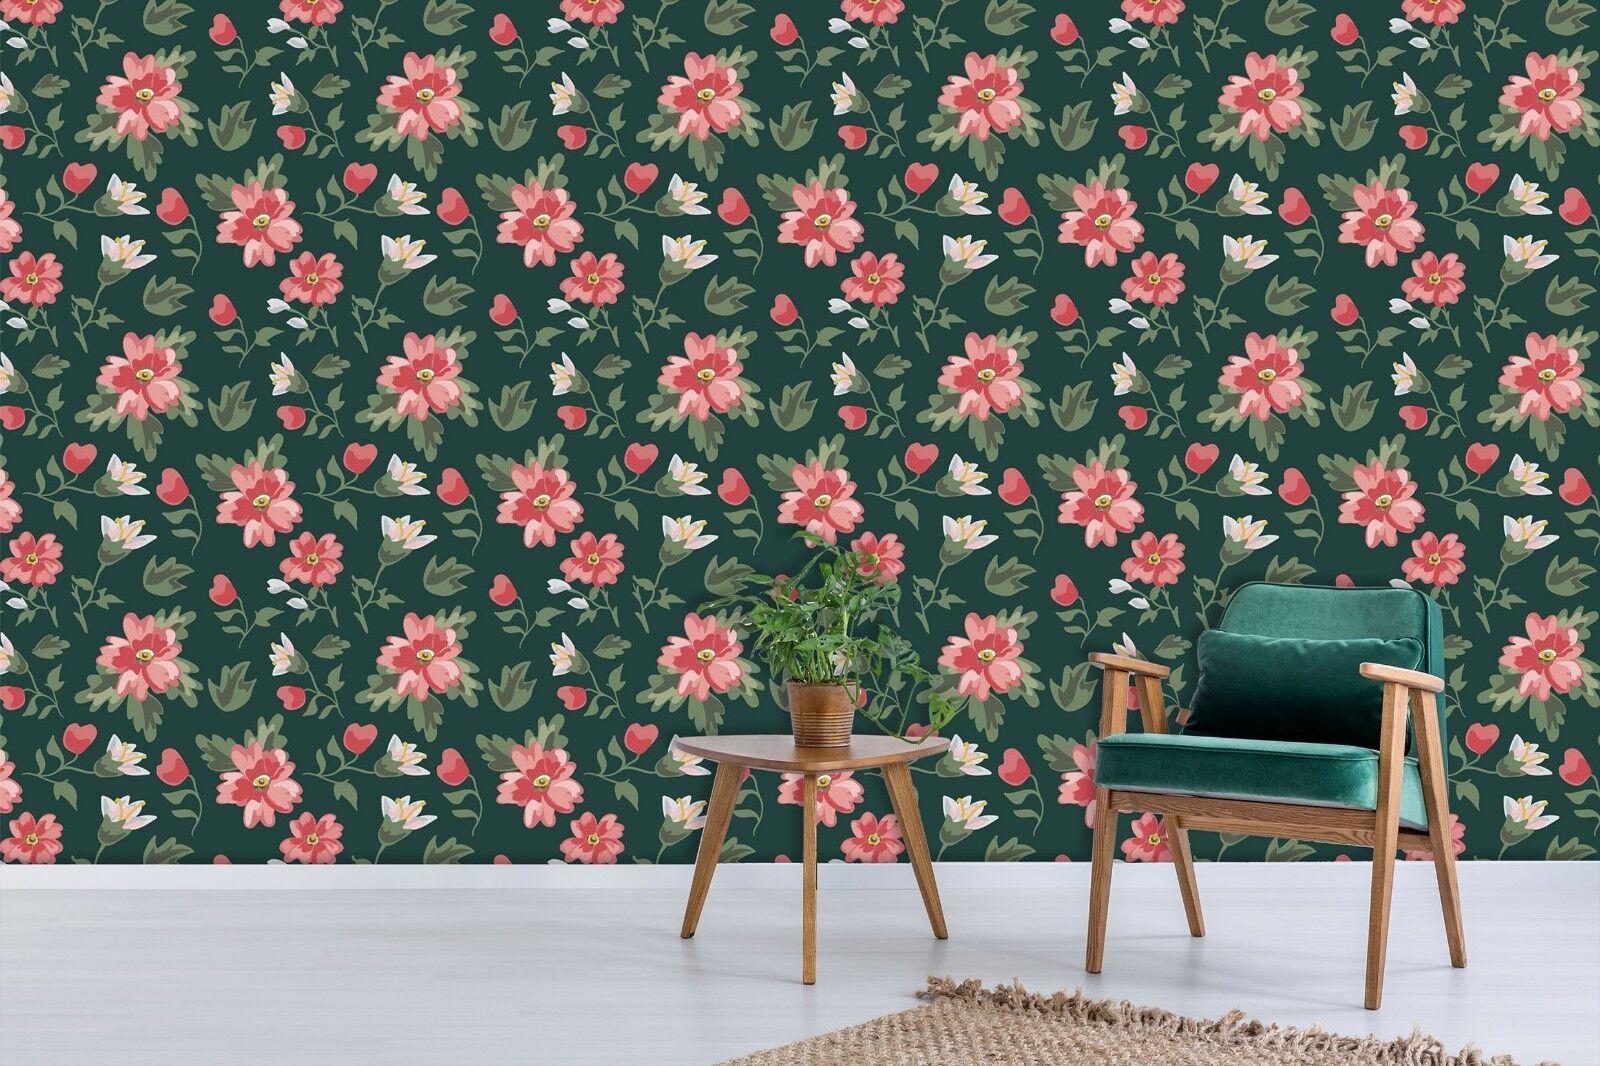 3D Flower Graffiti Bloom 21091 Wallpaper Mural Wallpaper UK Summer